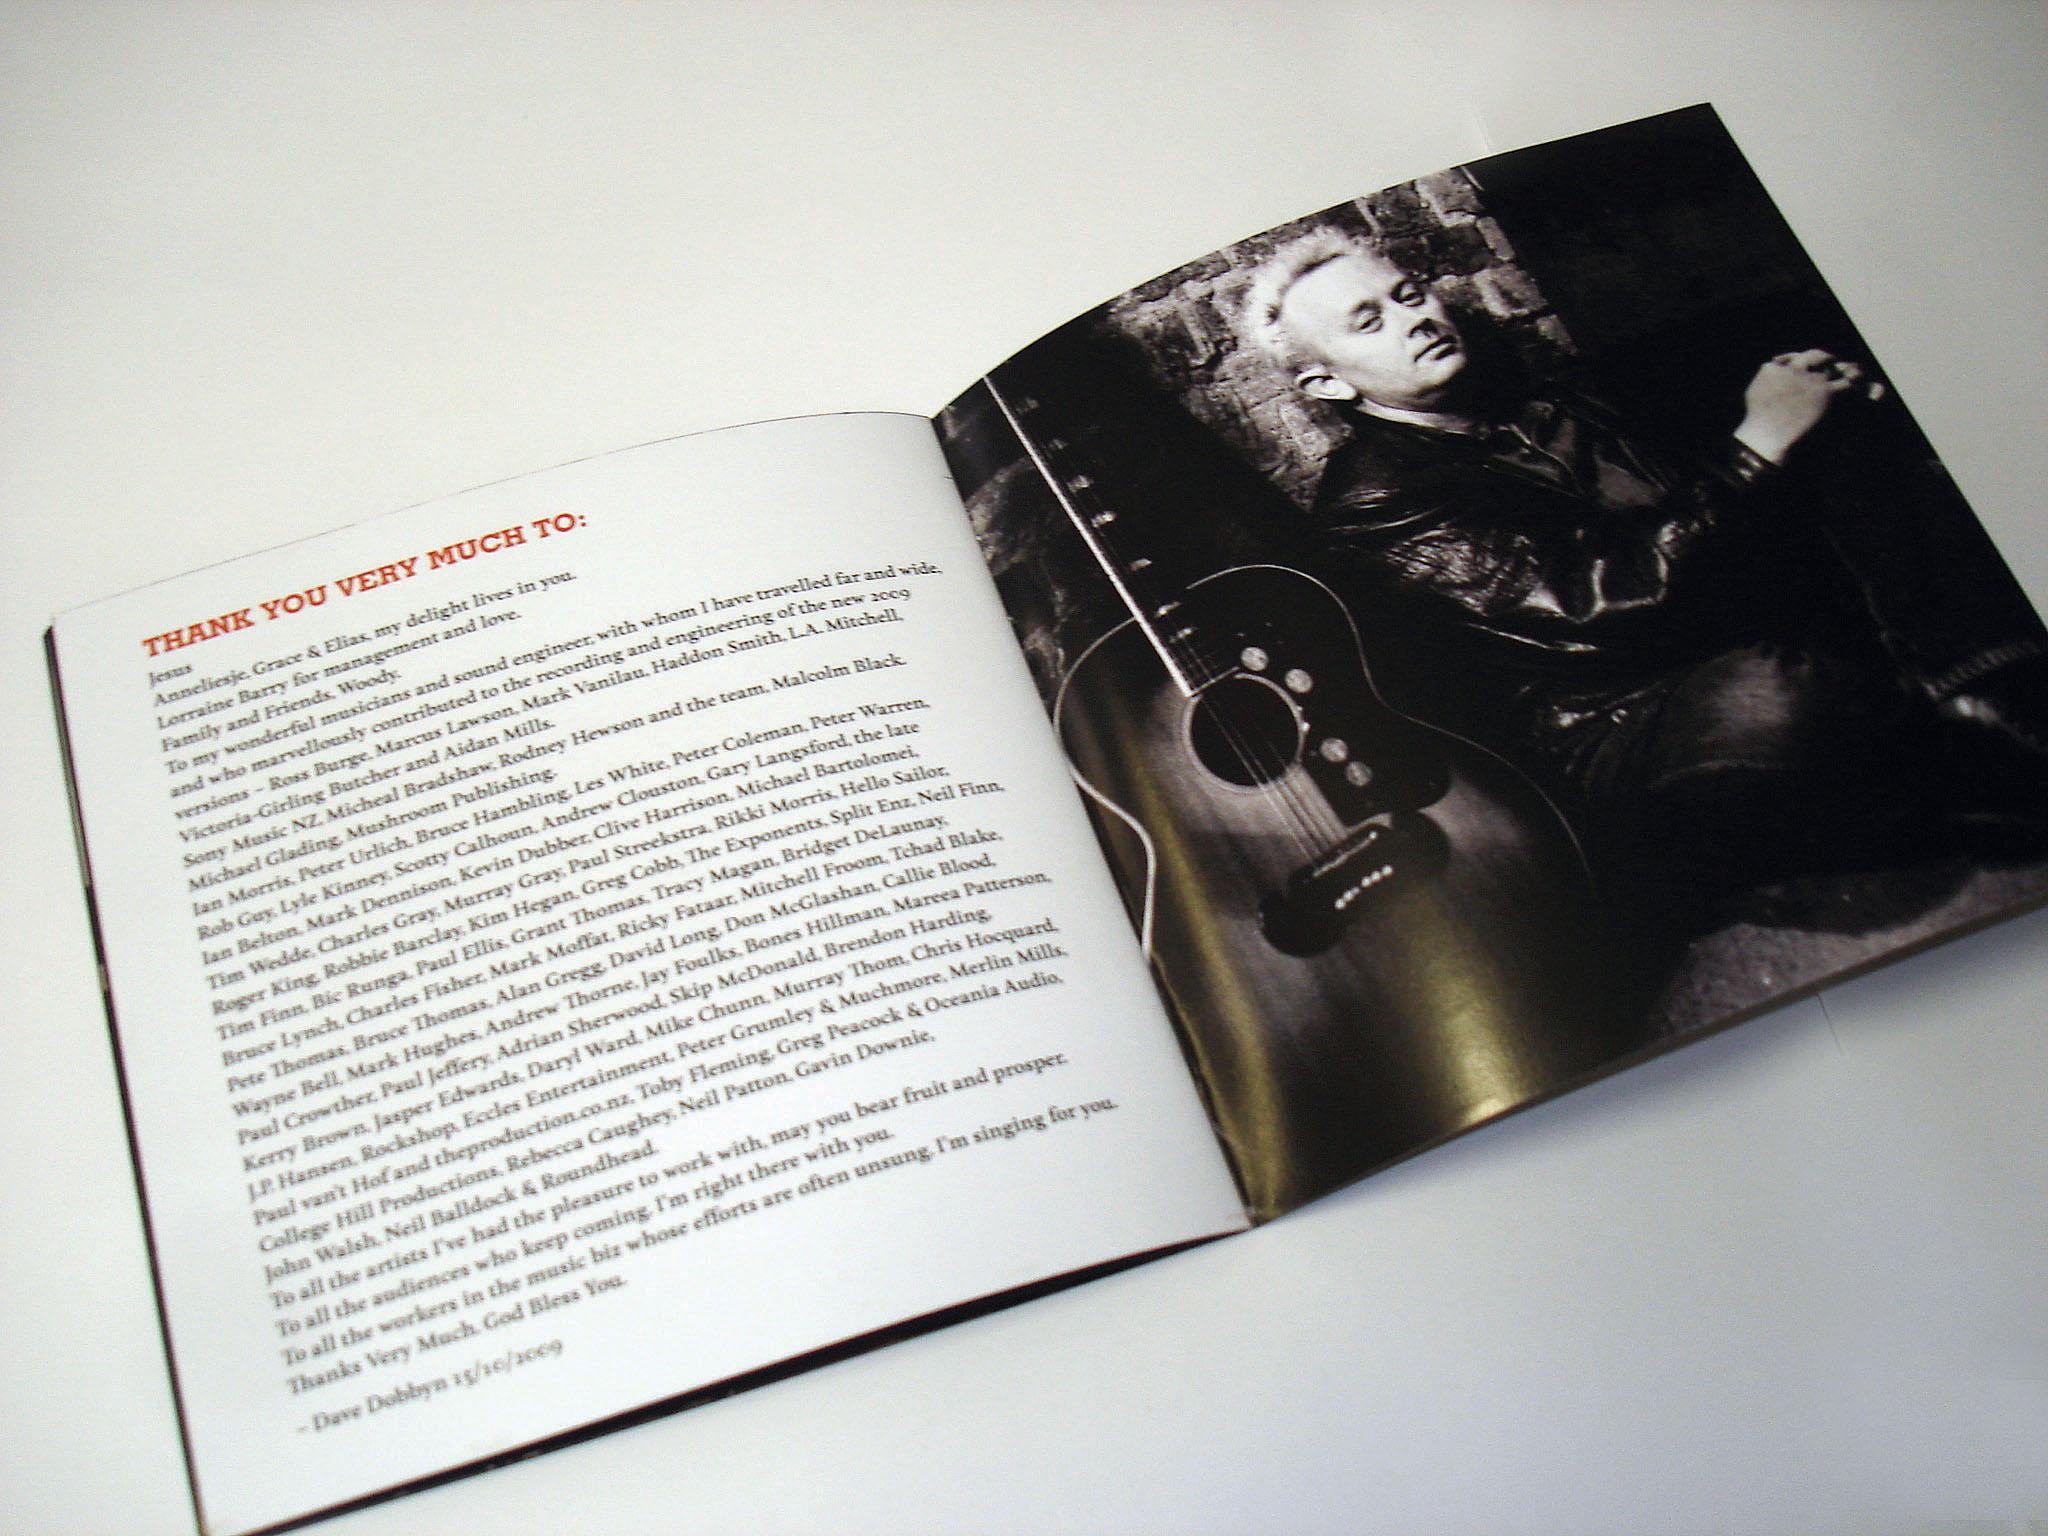 DAVE DOBBYN - BESIDE YOU - ALBUM / DVD